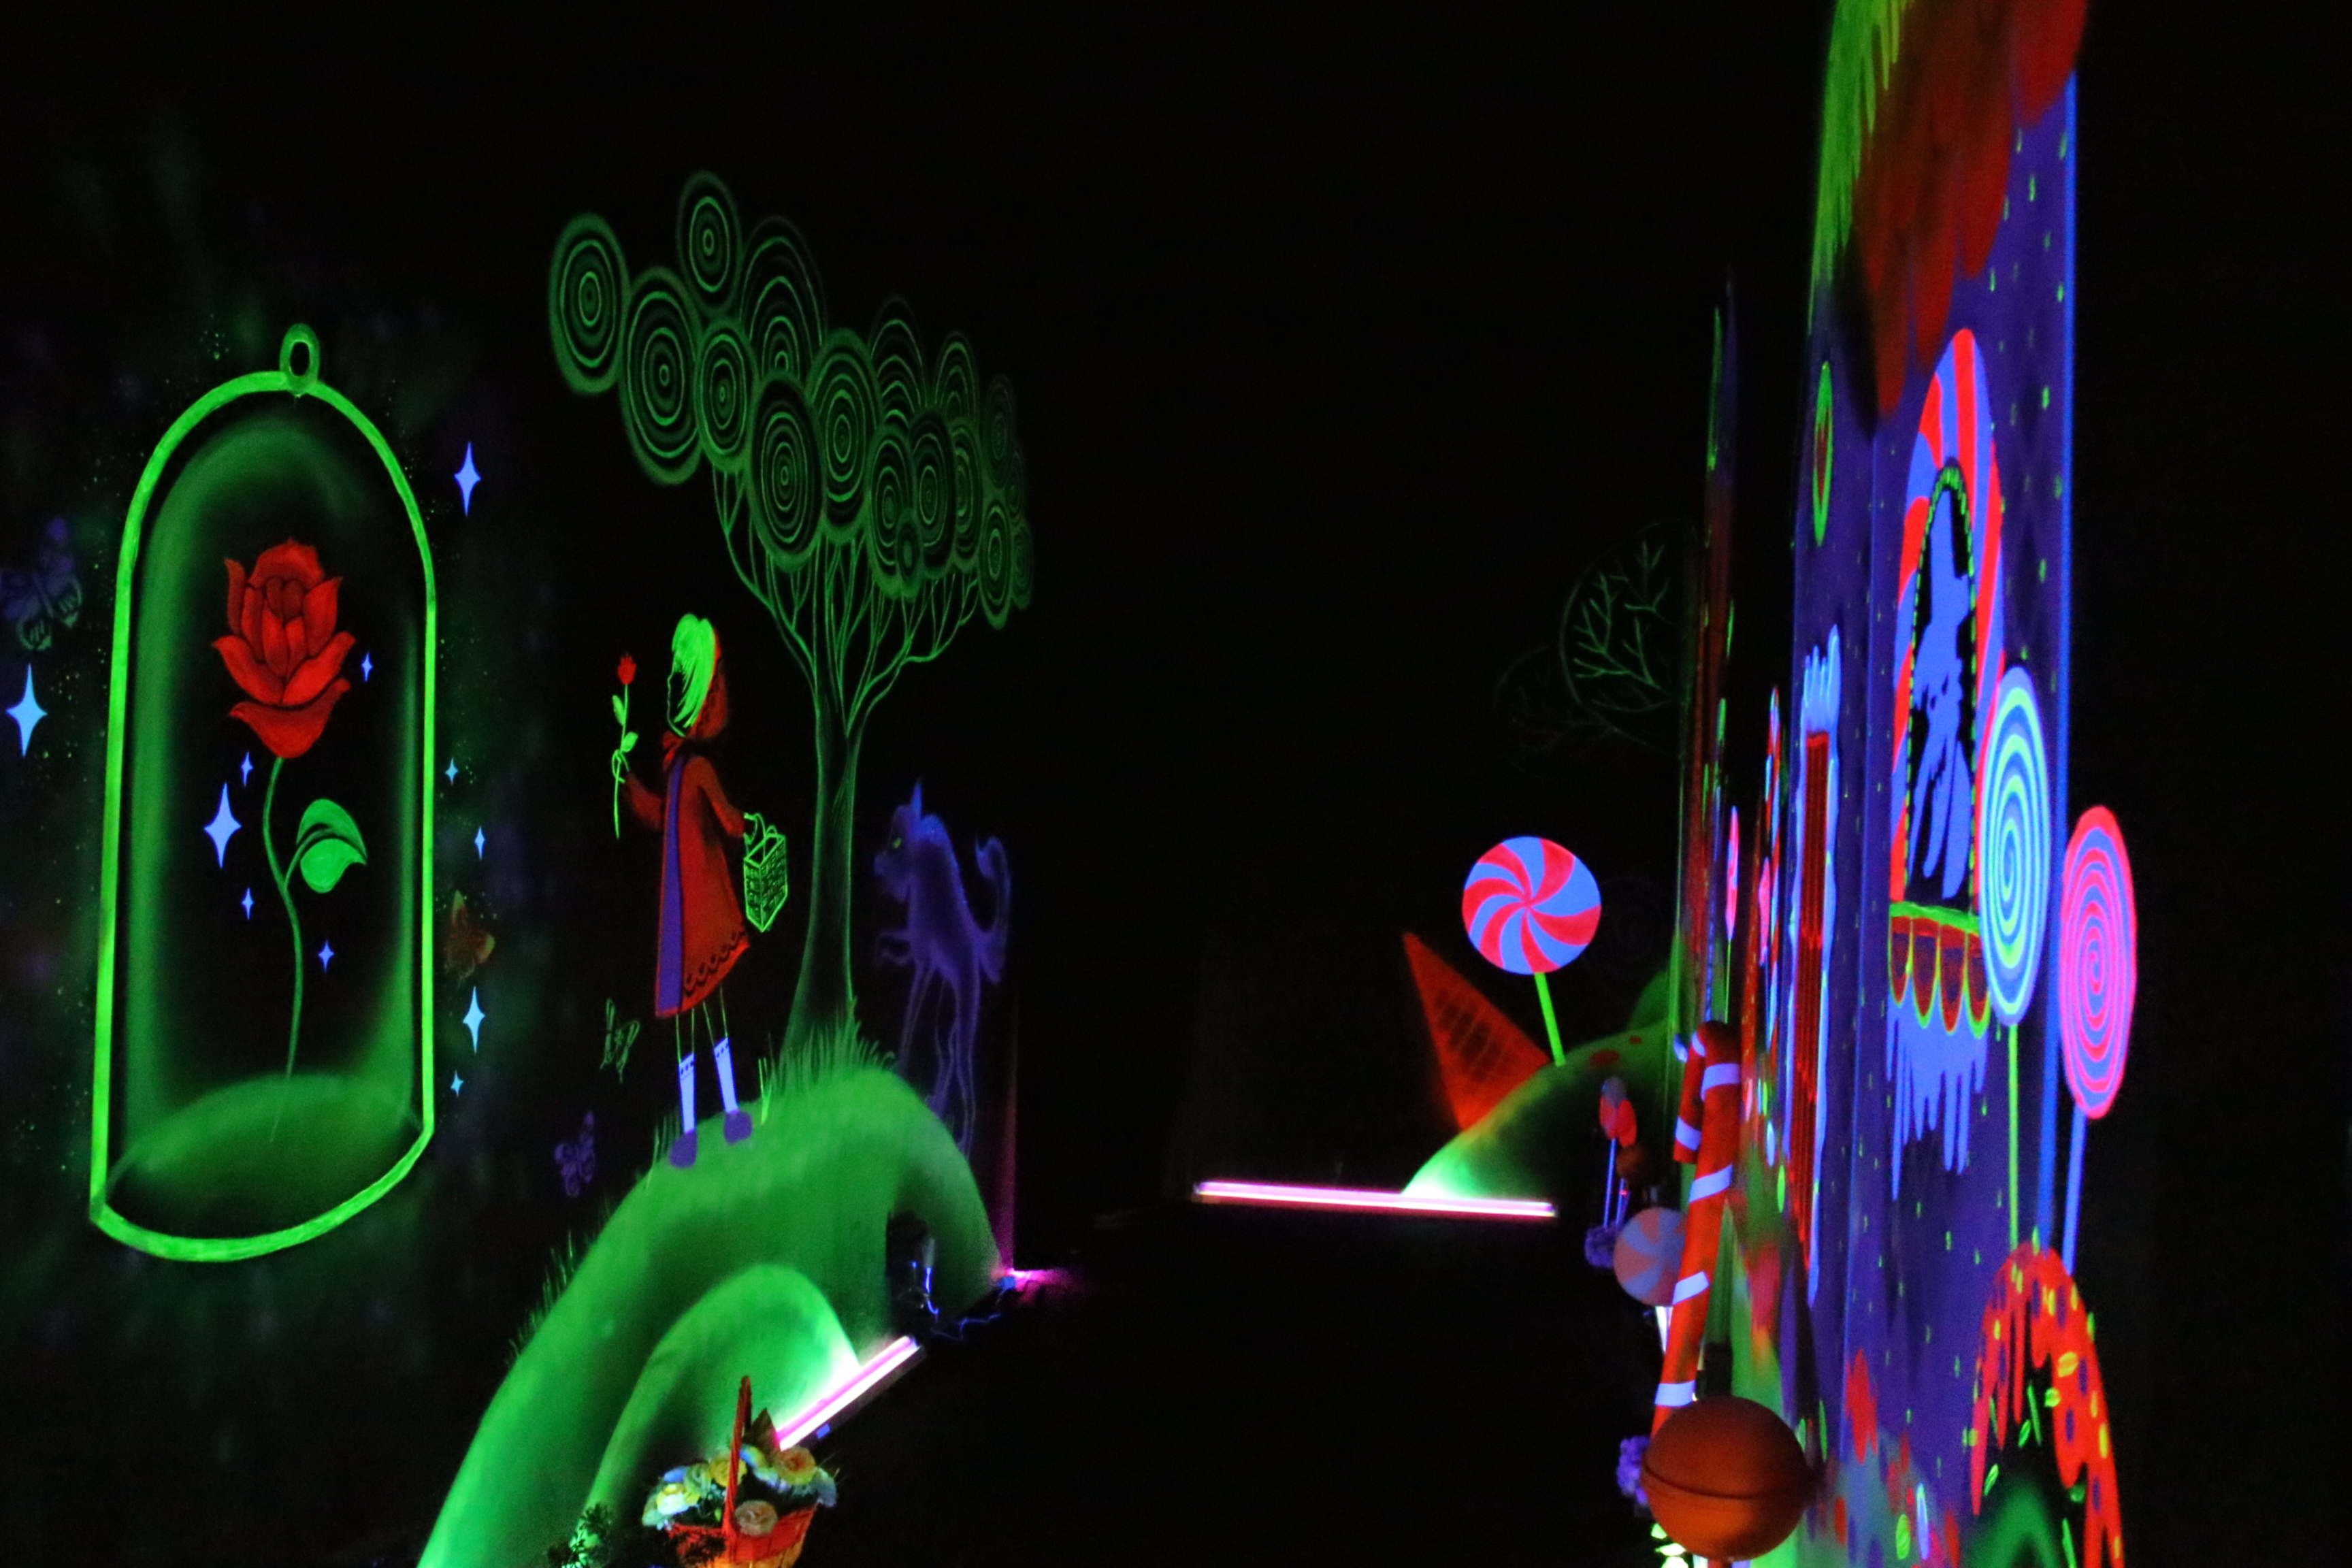 Glow-in-the-dark Graffiti